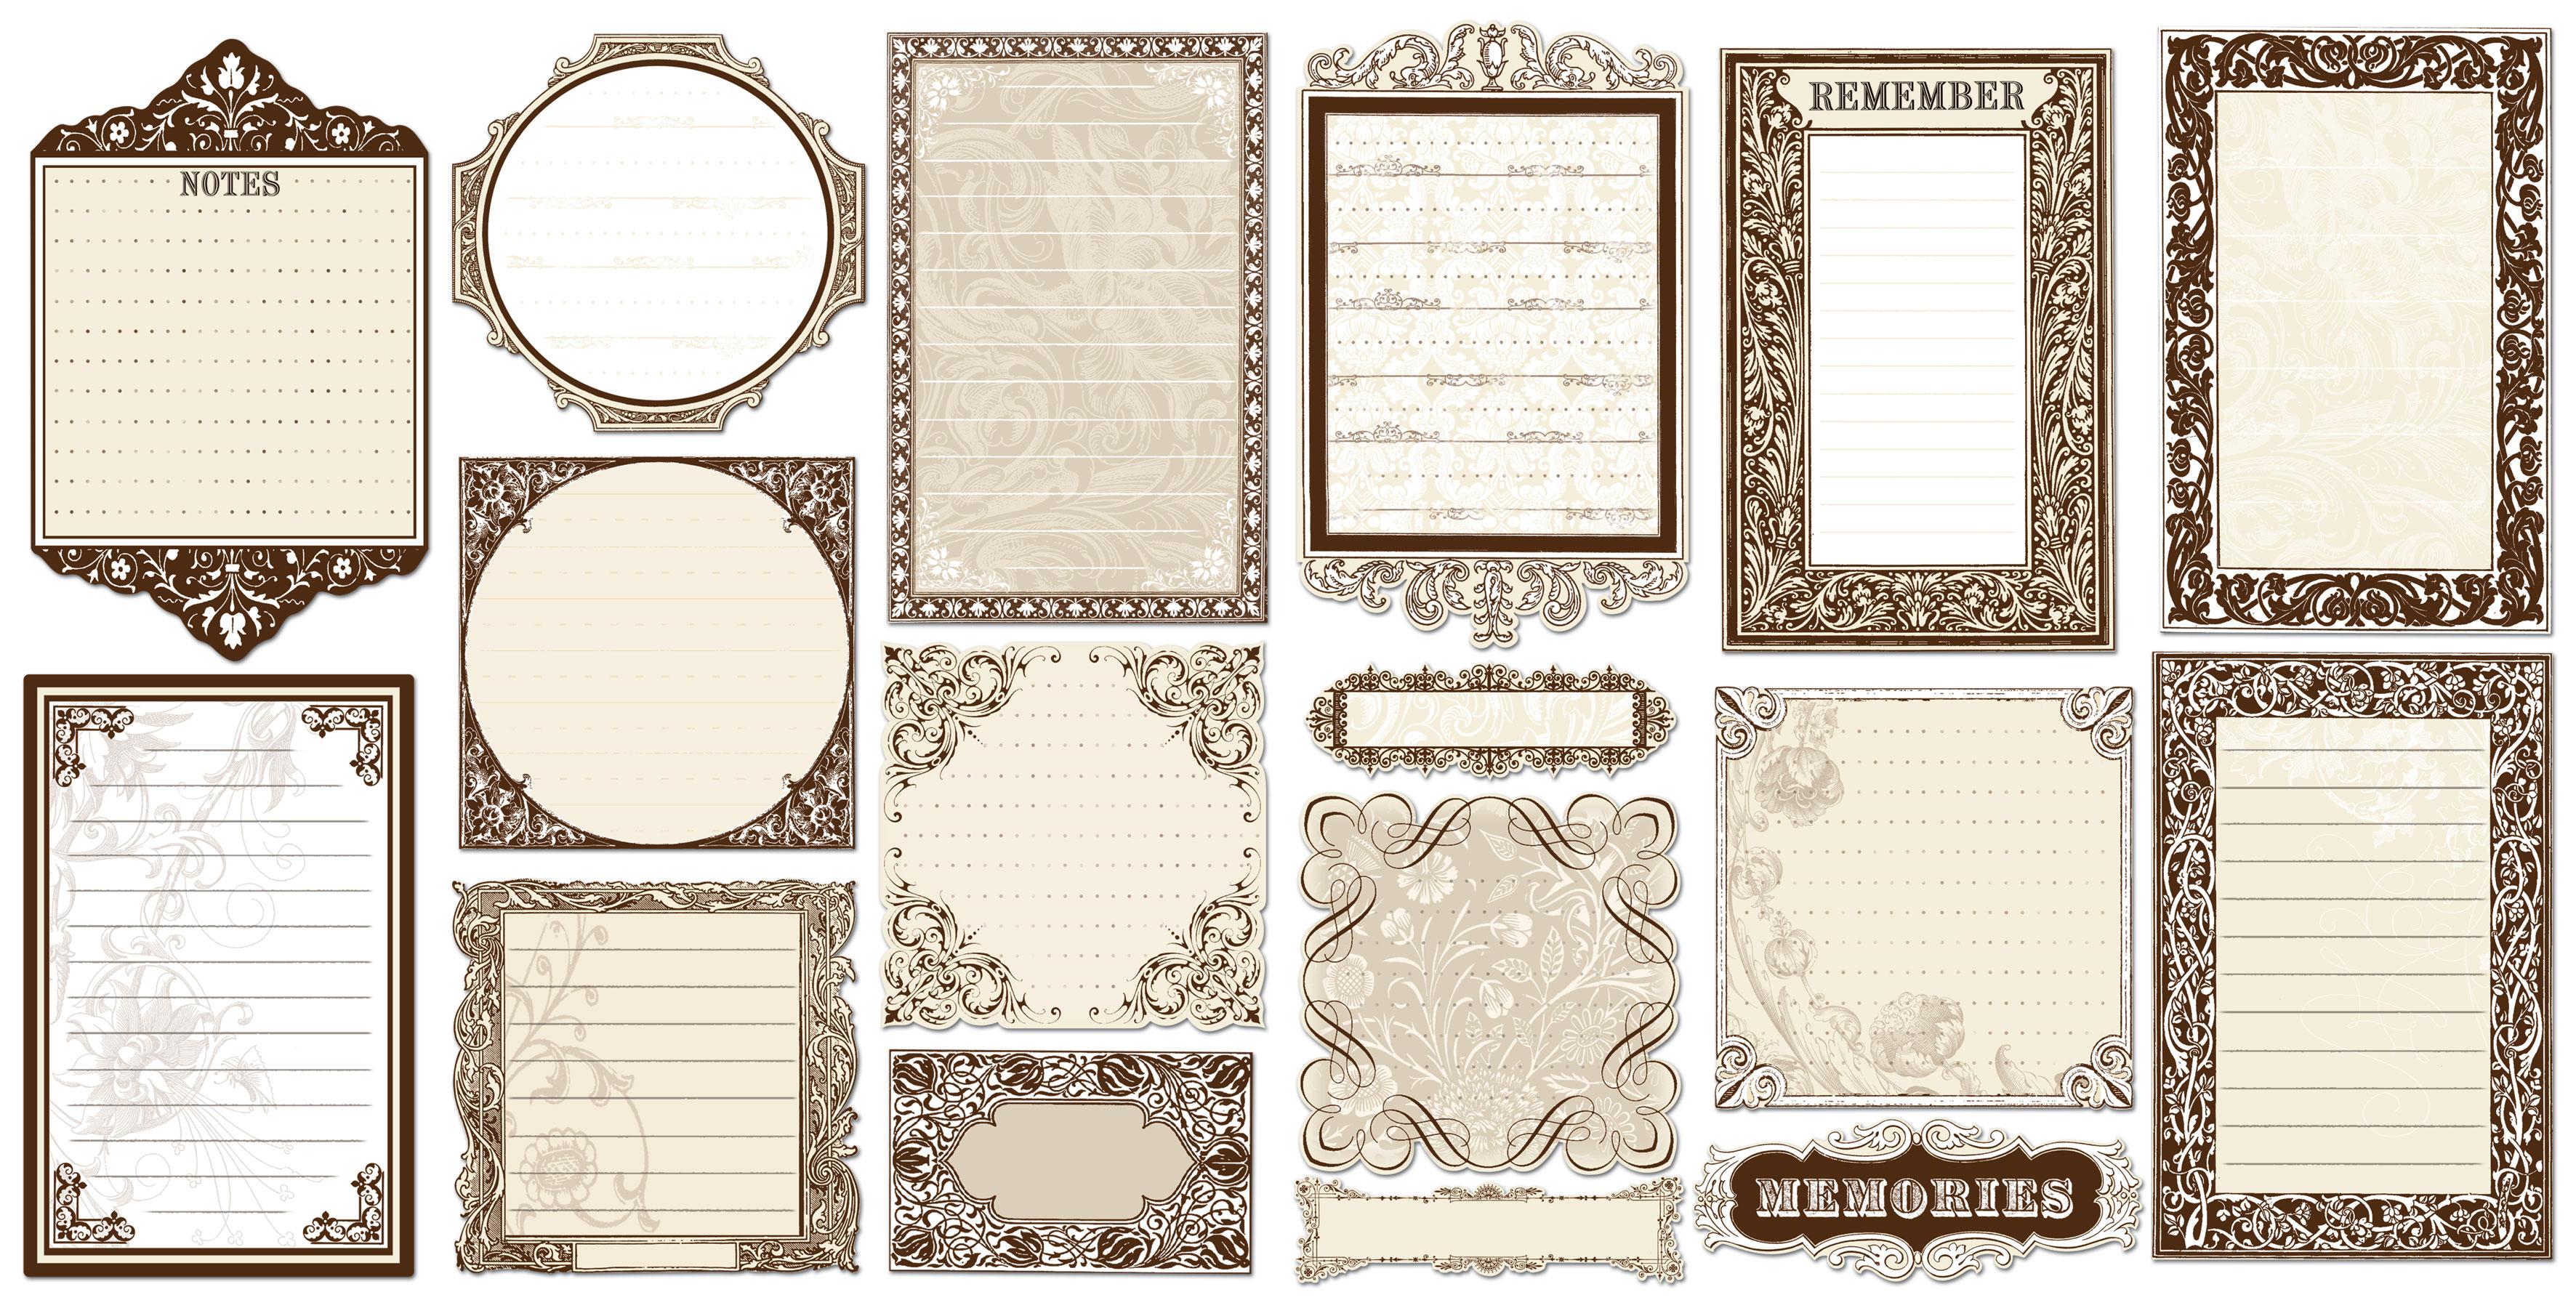 Журналинг к открыткам, открытки